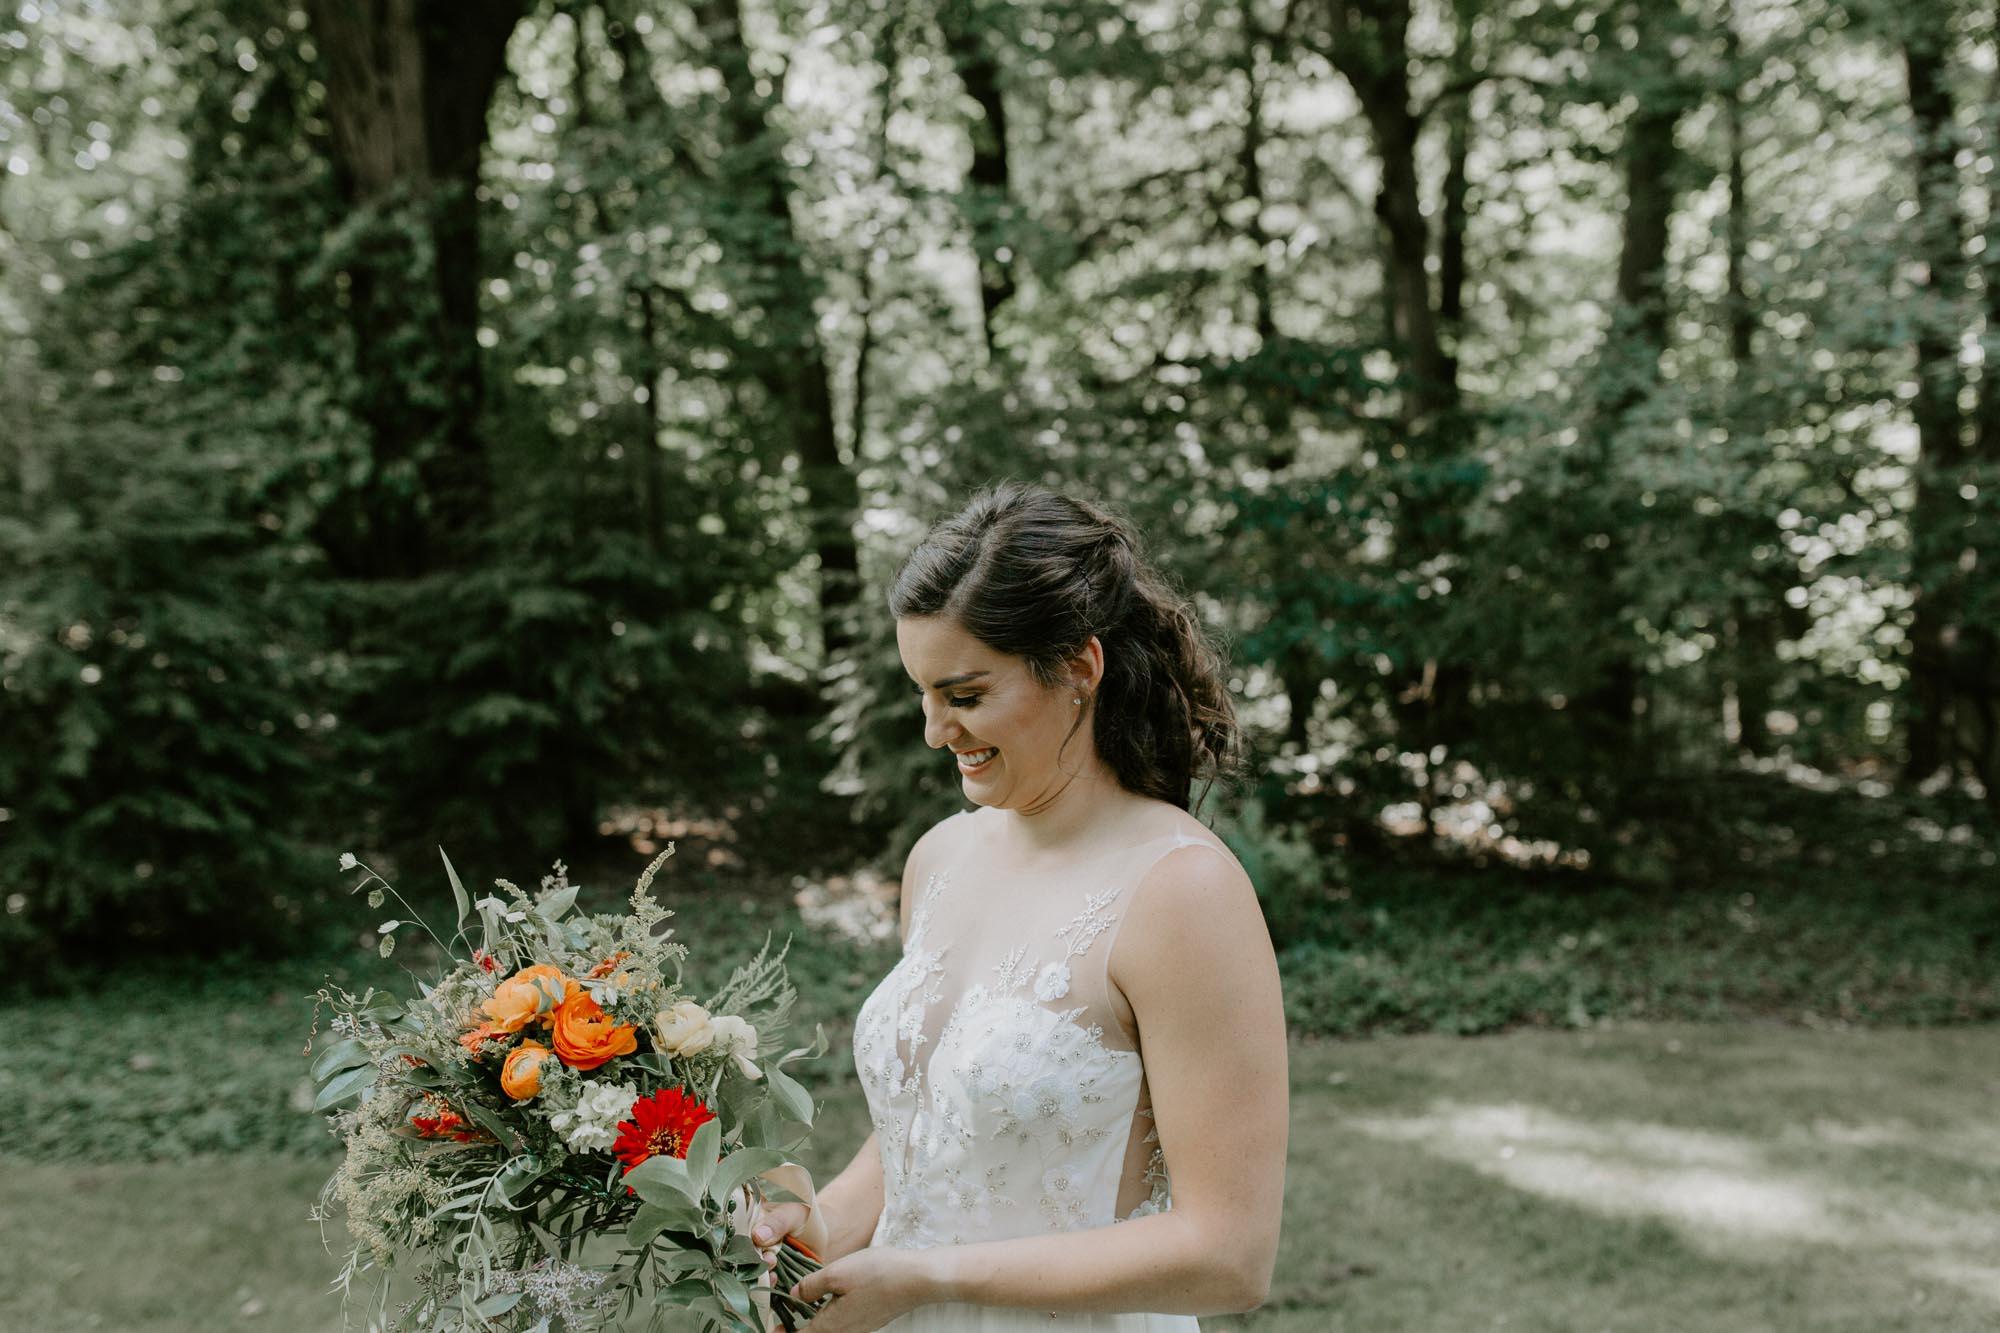 journeyman_distillery_wedding_photographer_chicago_il_wright_photographs-2230.jpg